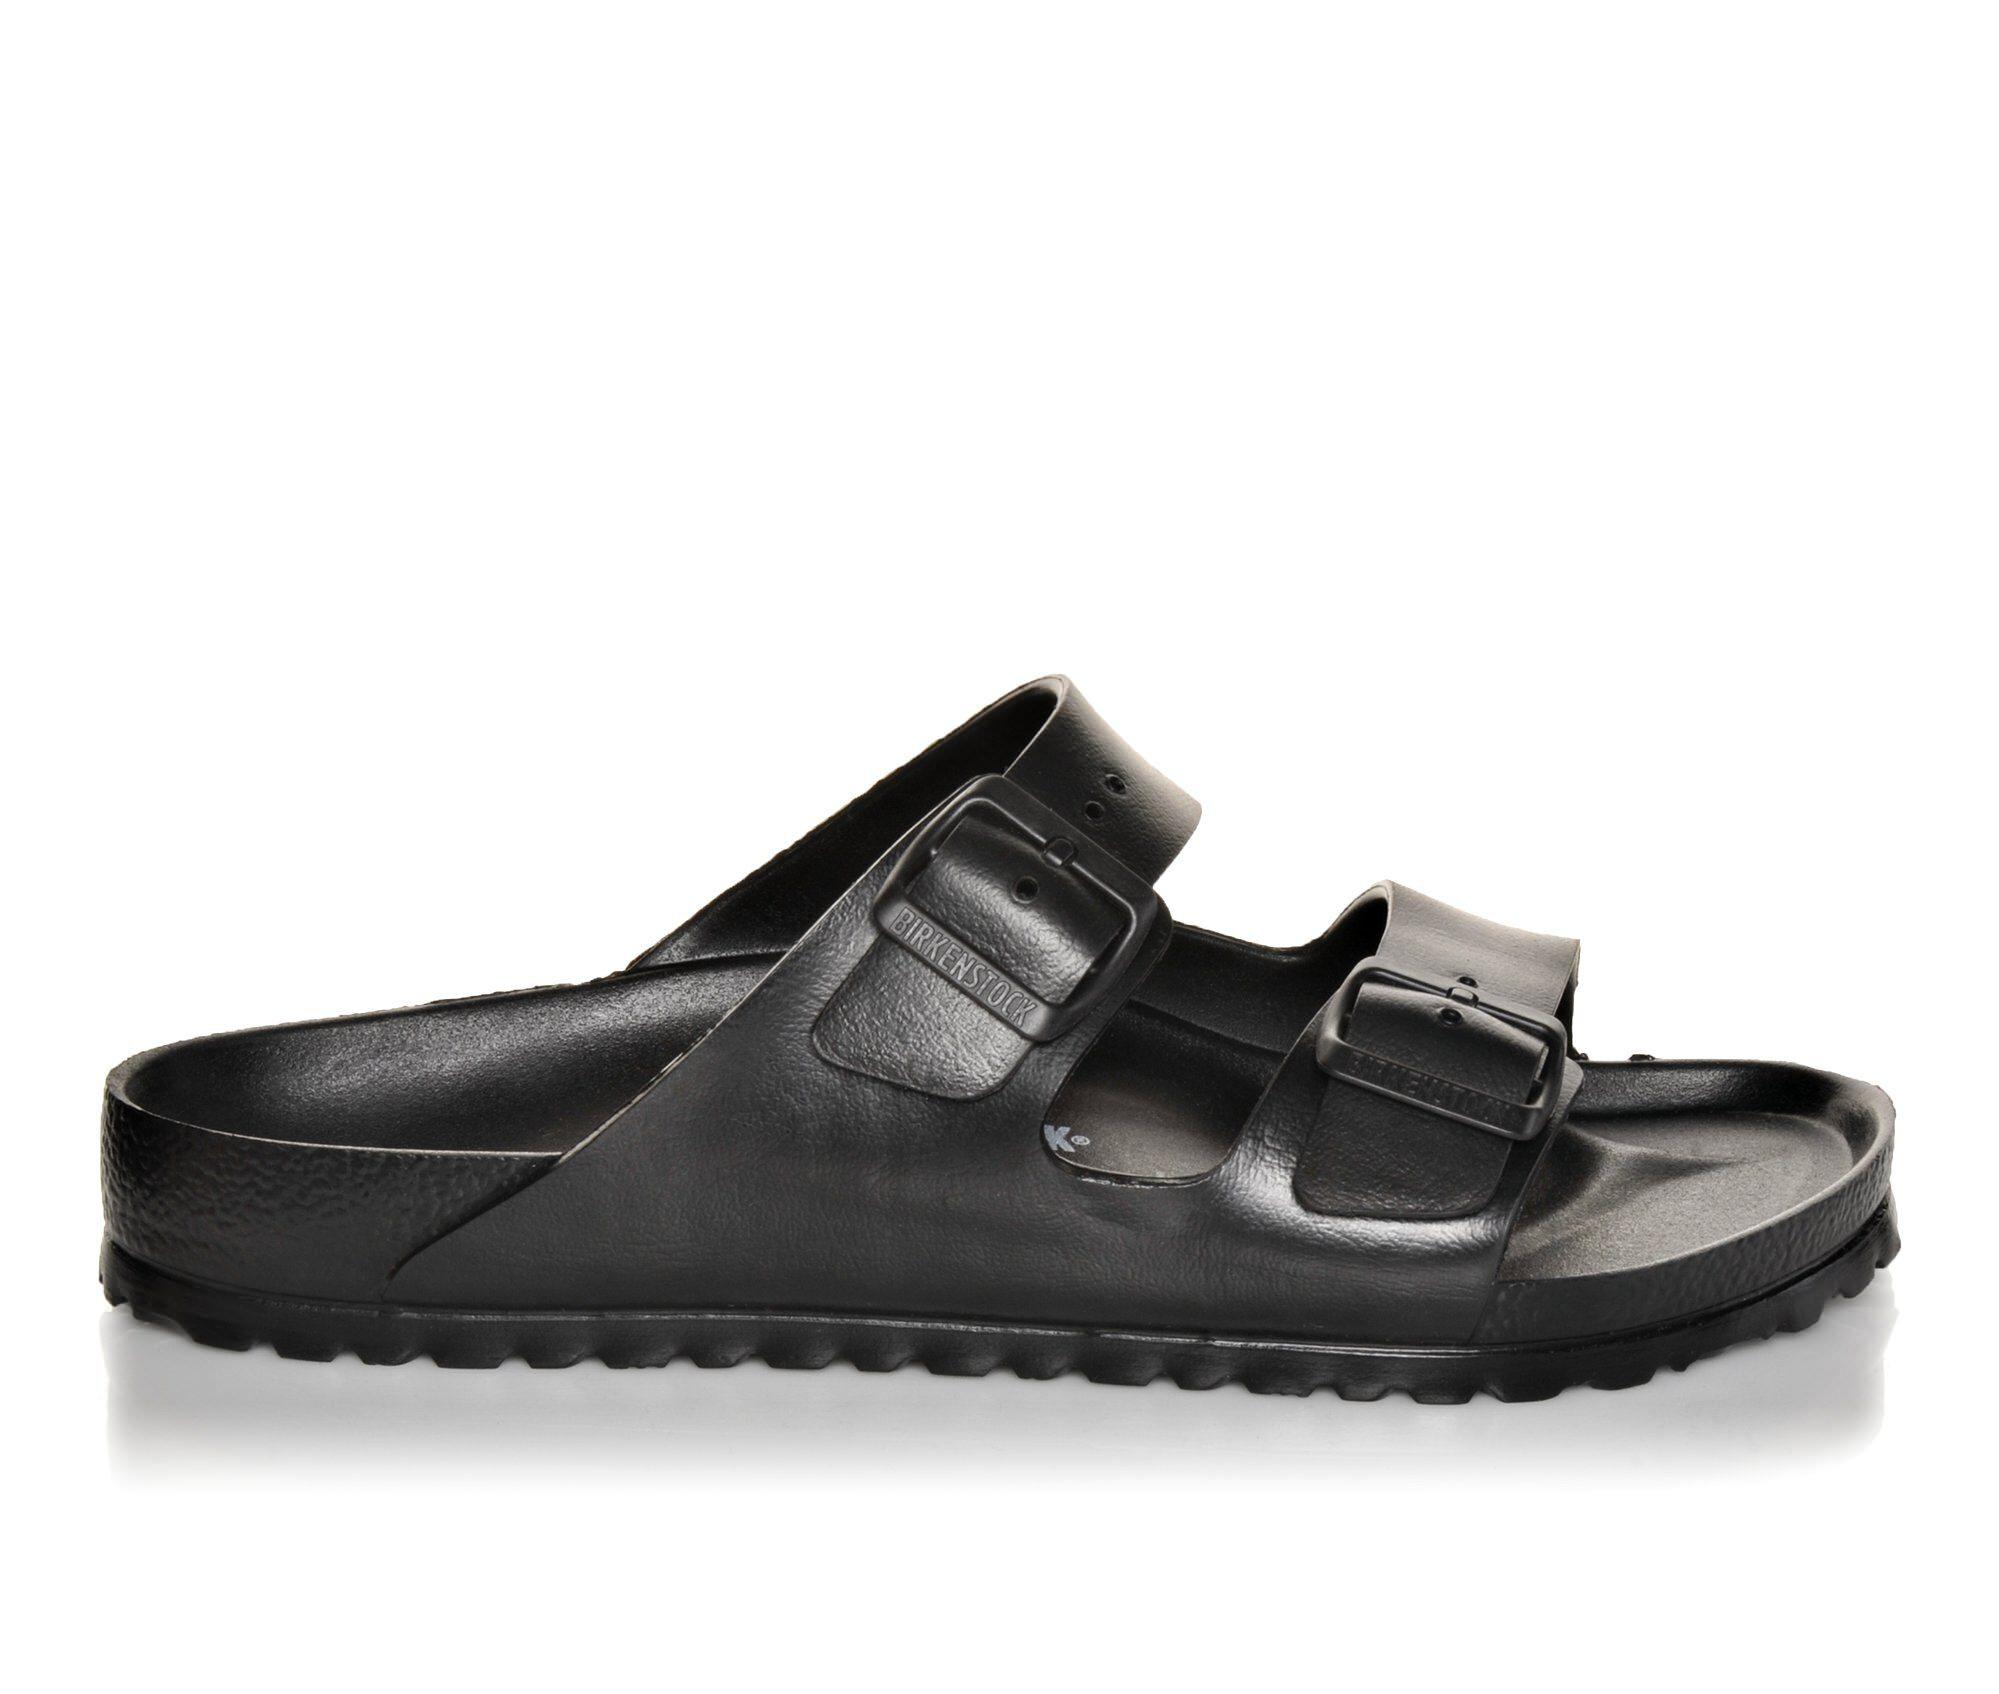 uk shoes_kd2610